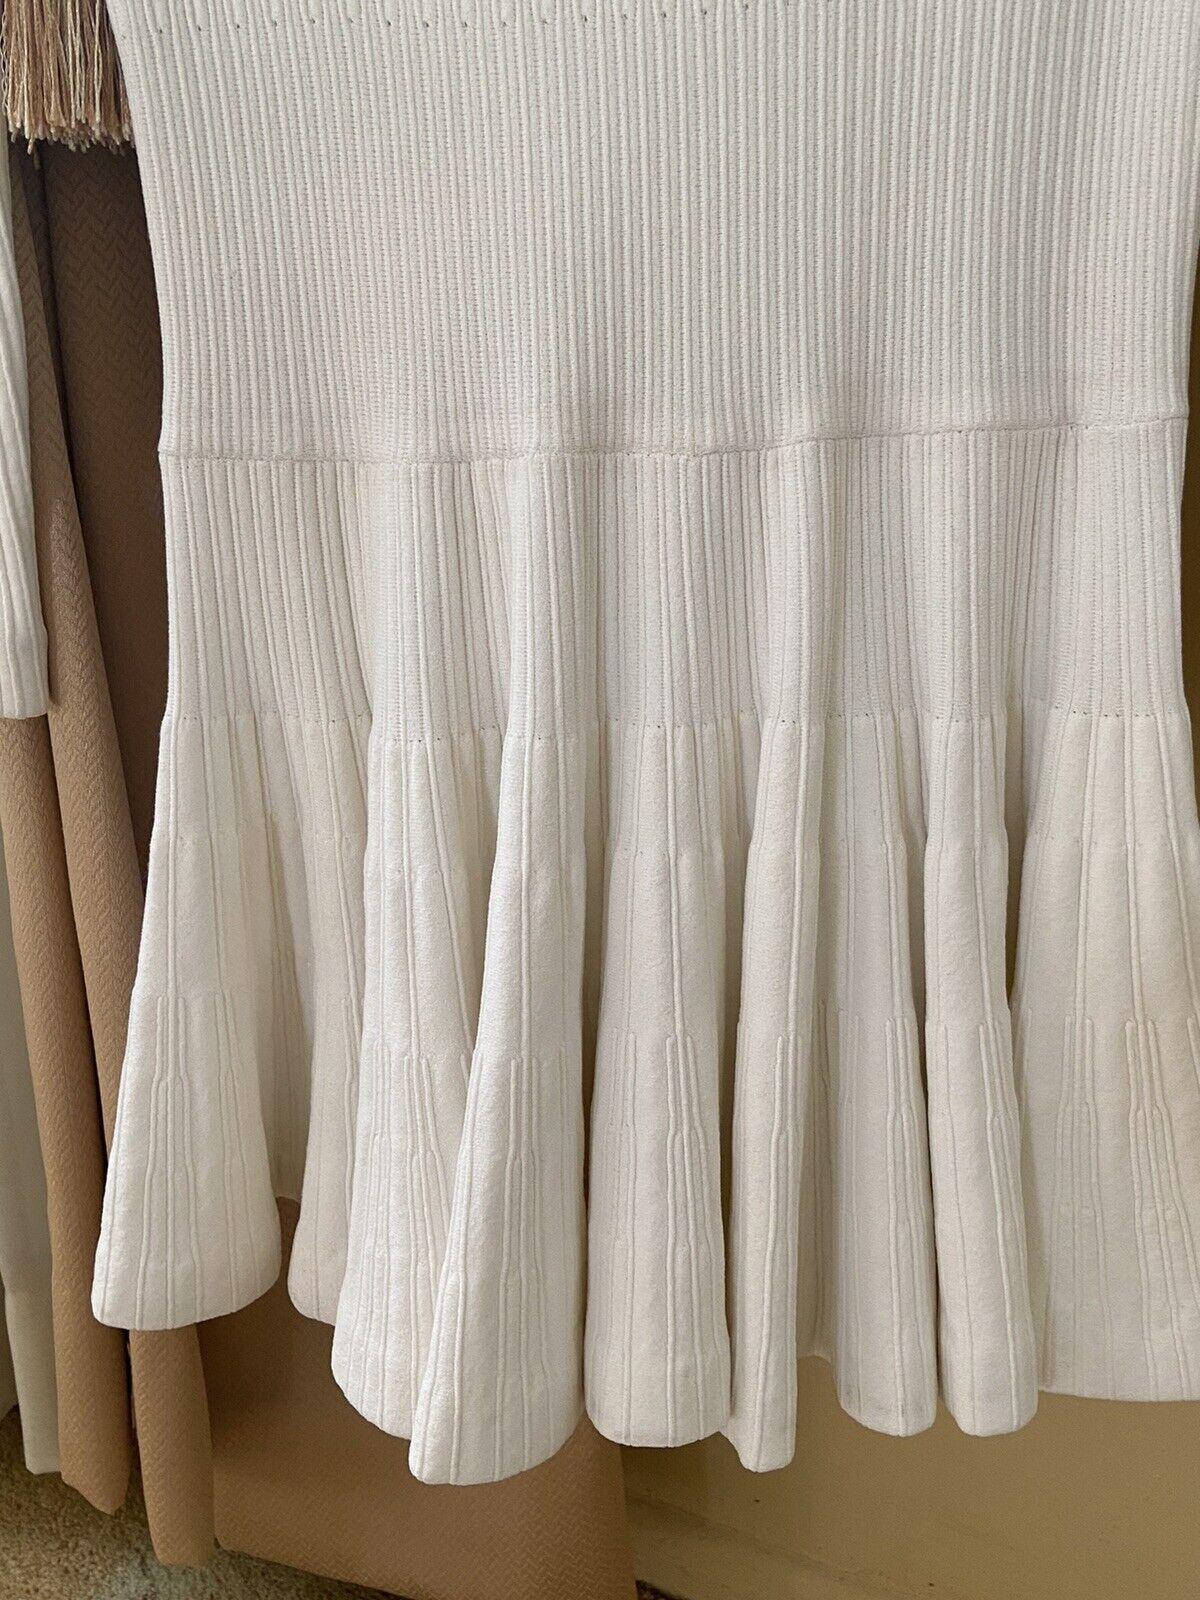 Azzedine Alaia White Long Sleeve Top Blouse Dress… - image 5